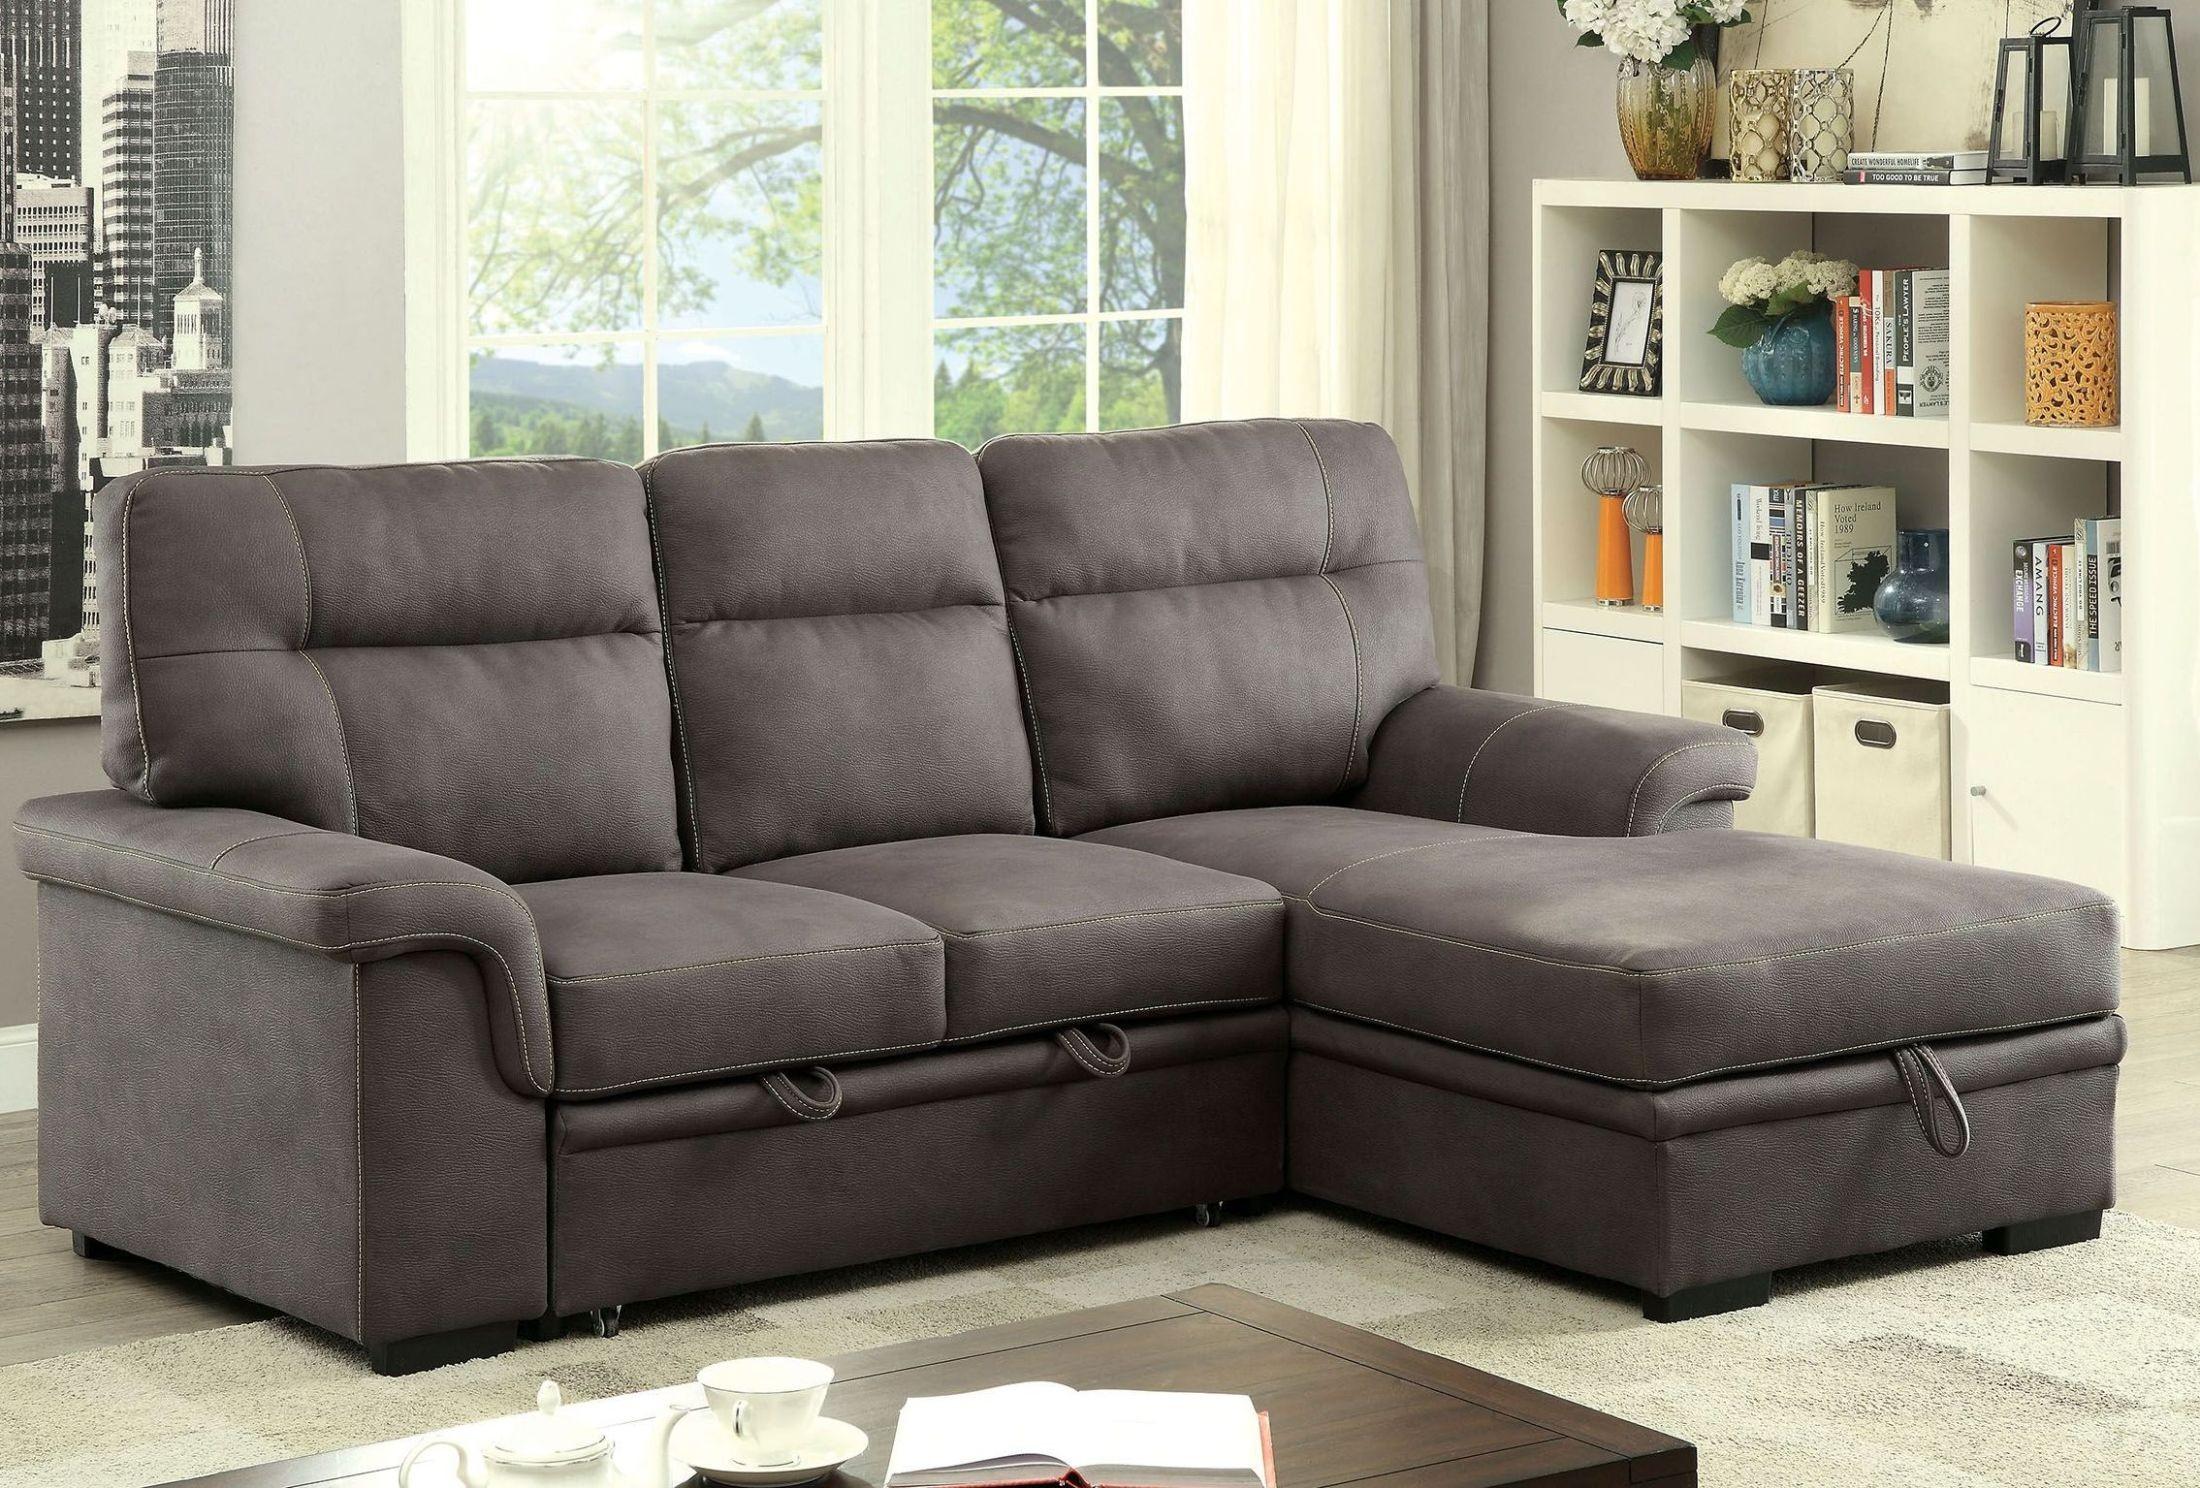 beautiful furniture of america lawrence sectional sofa sleep